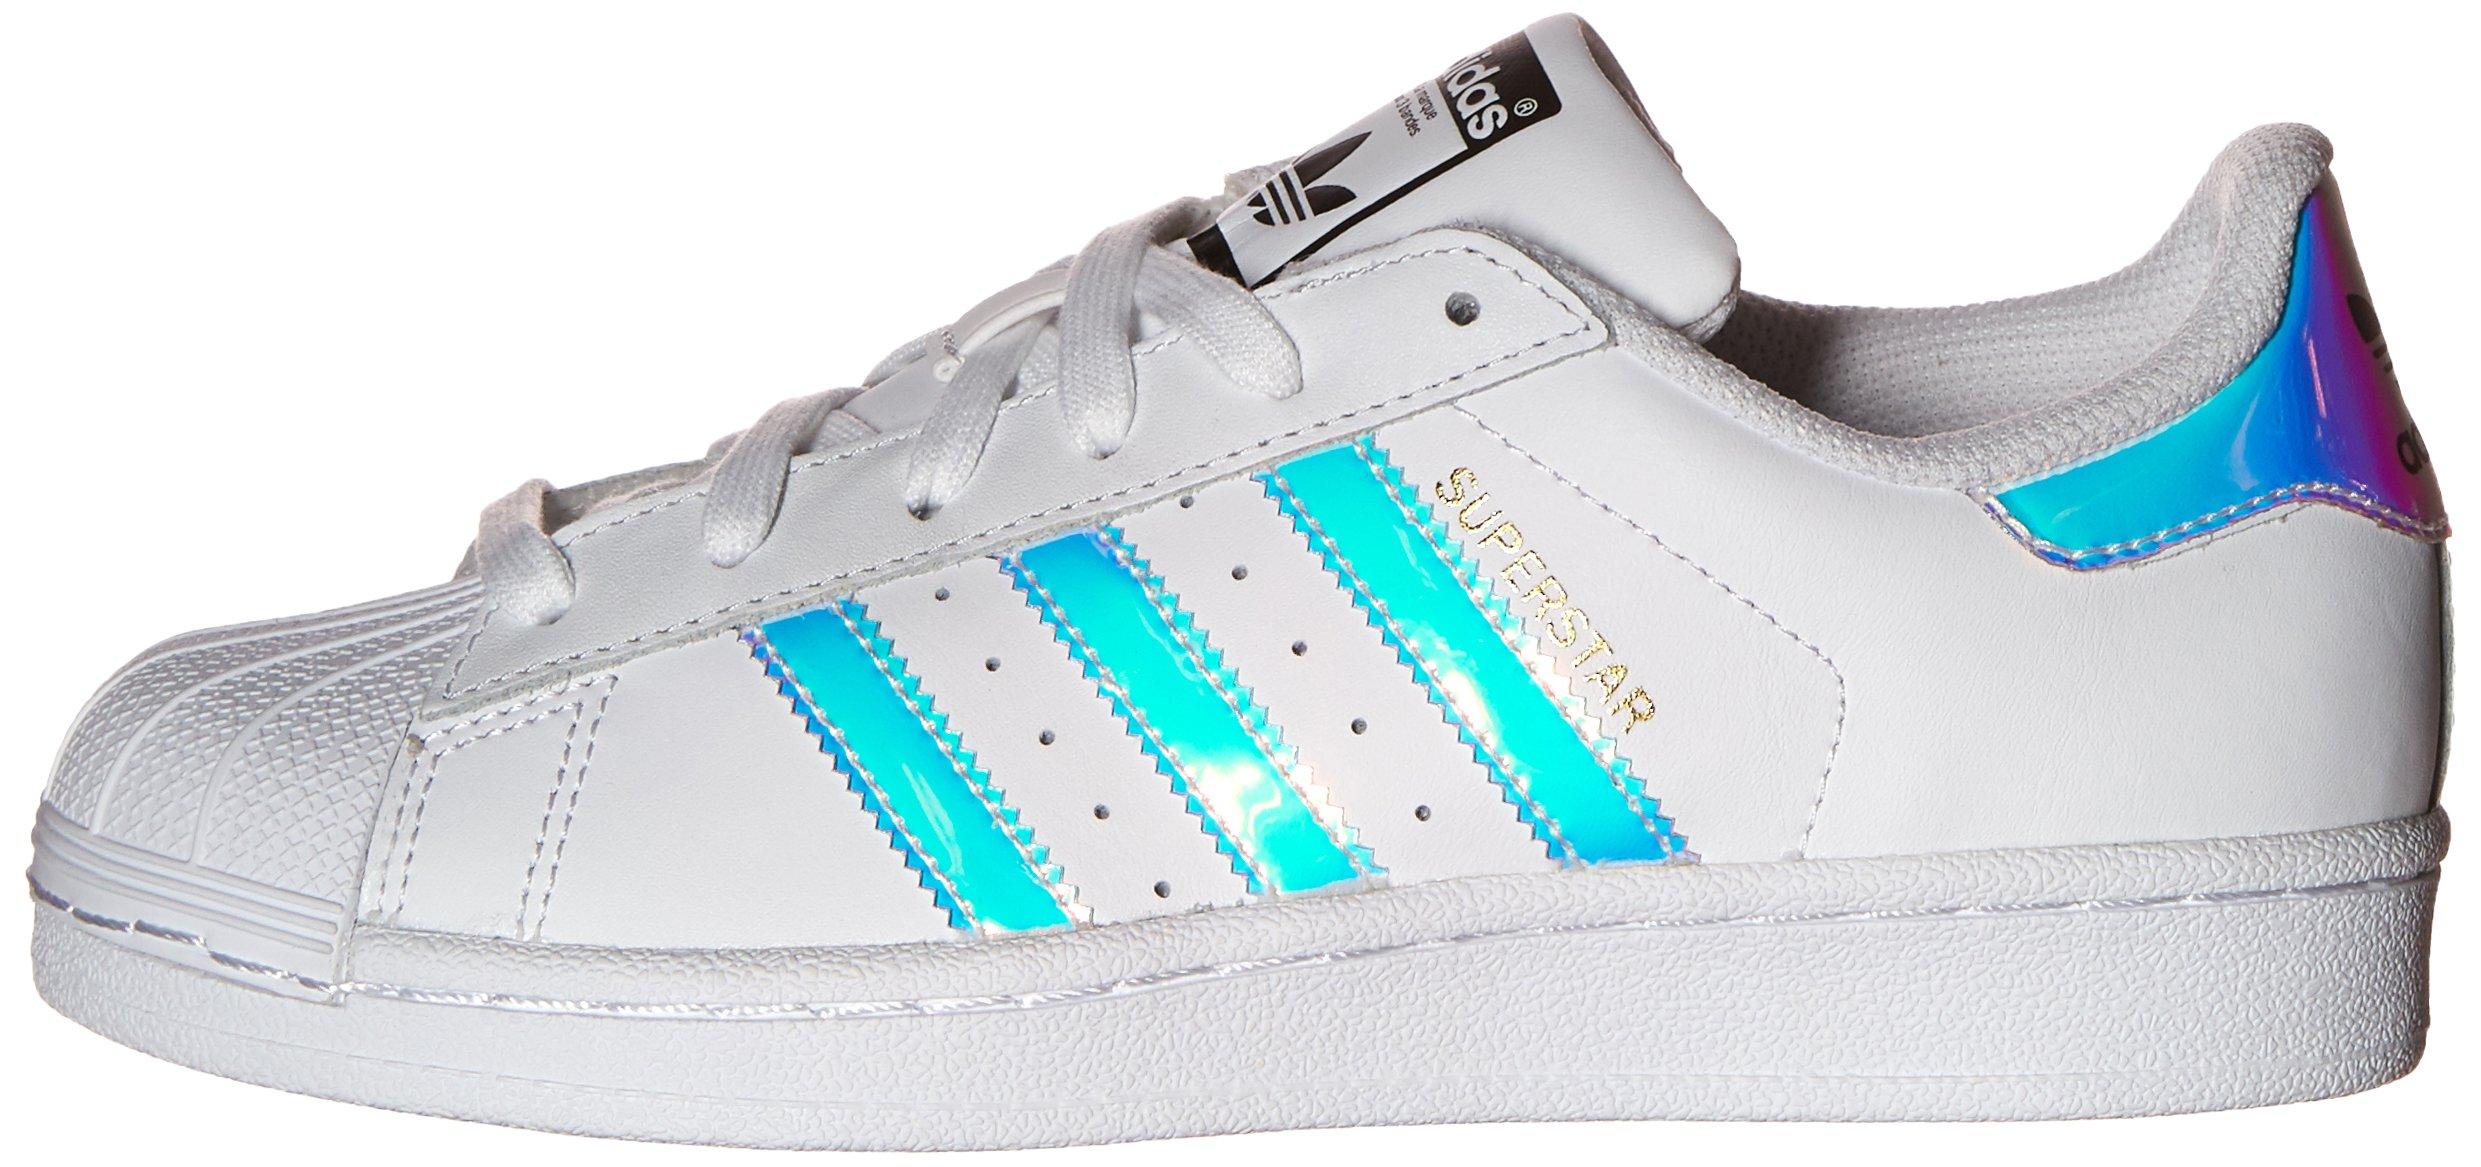 adidas Originals Kid's Superstar J Shoe, White/White/Metallic Silver, 4 M US Big Kid by adidas Originals (Image #5)